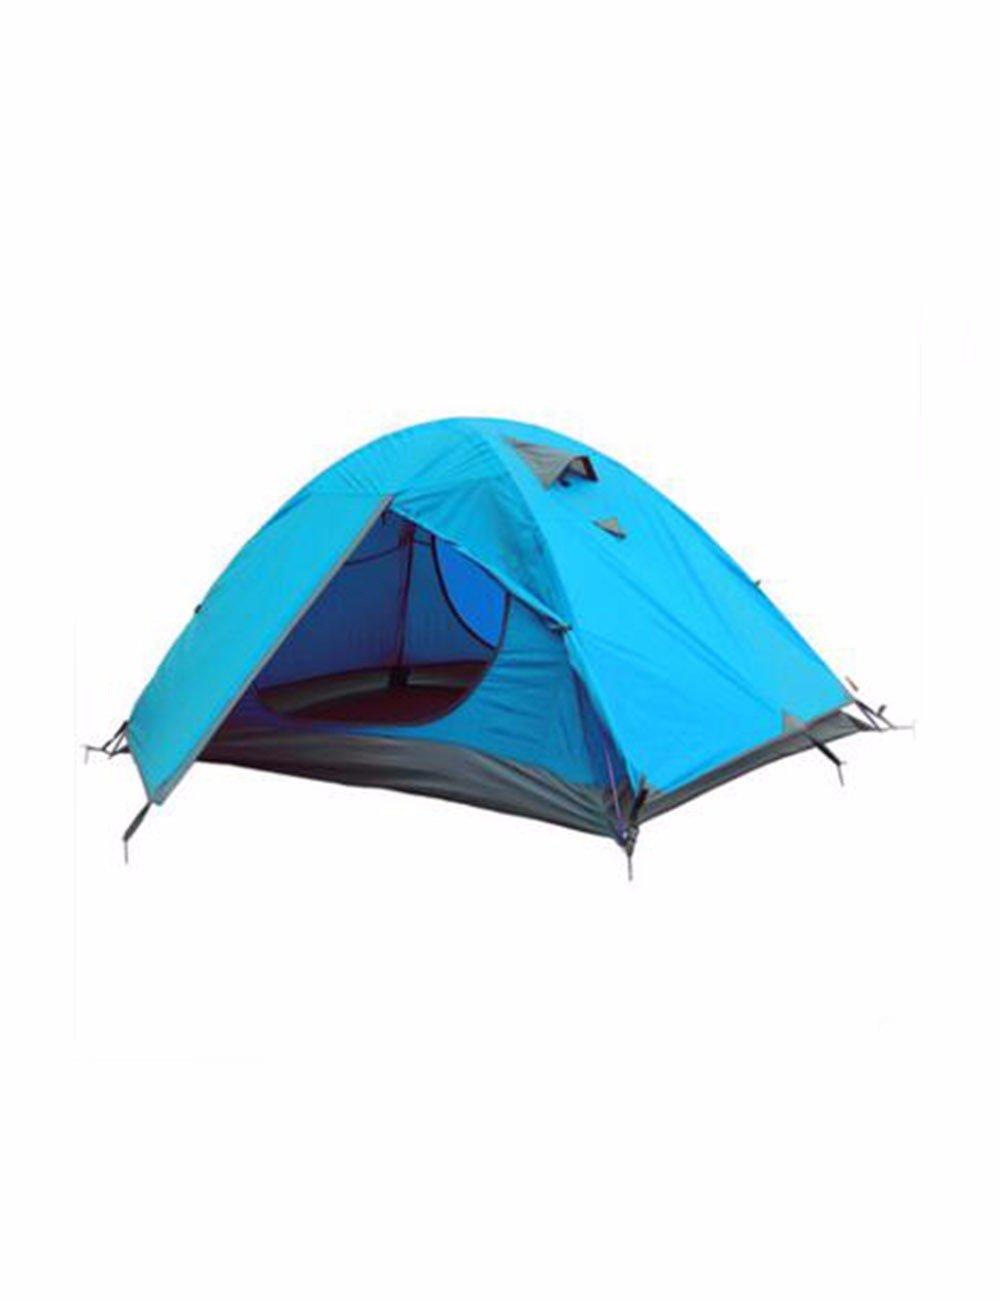 SJQKA-Zelt Outdoor Doppel Anti-Rainstorm Wandern Camping Zelt